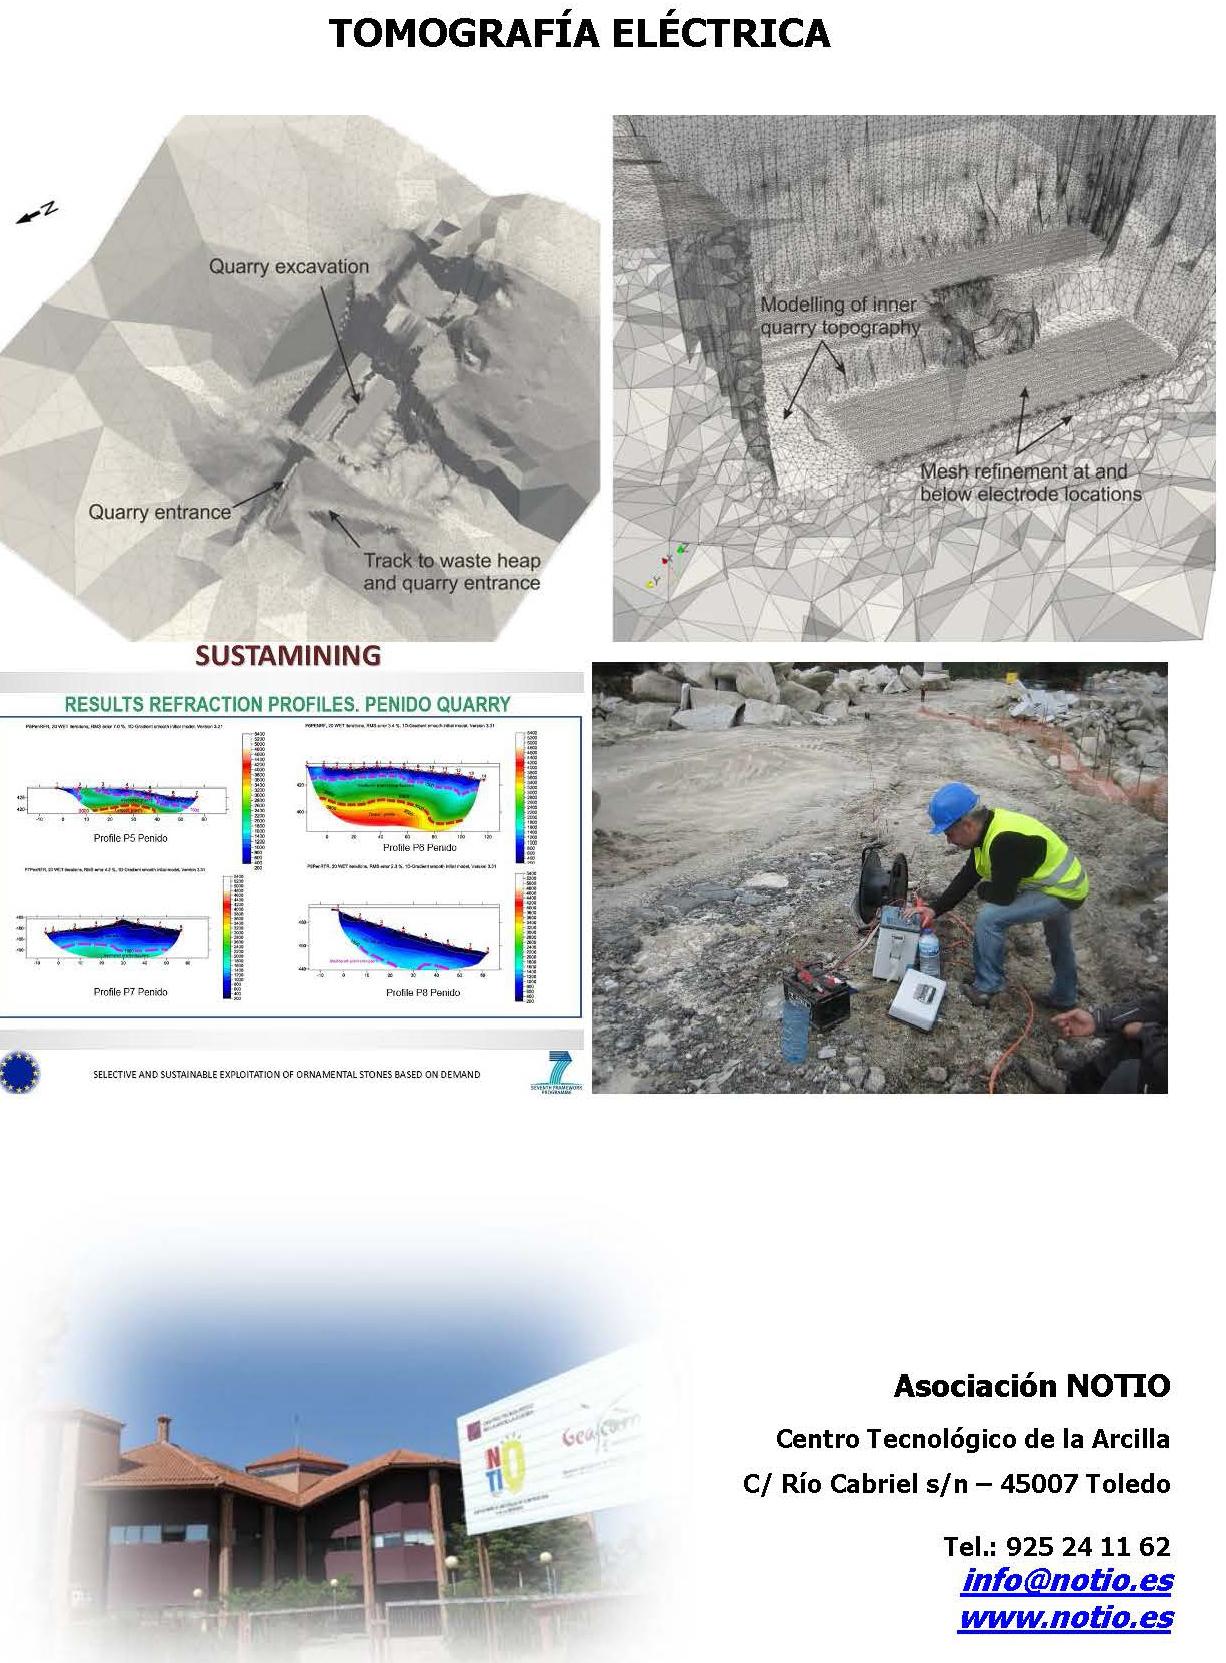 geofisica tomografia eléctrica NOTIO